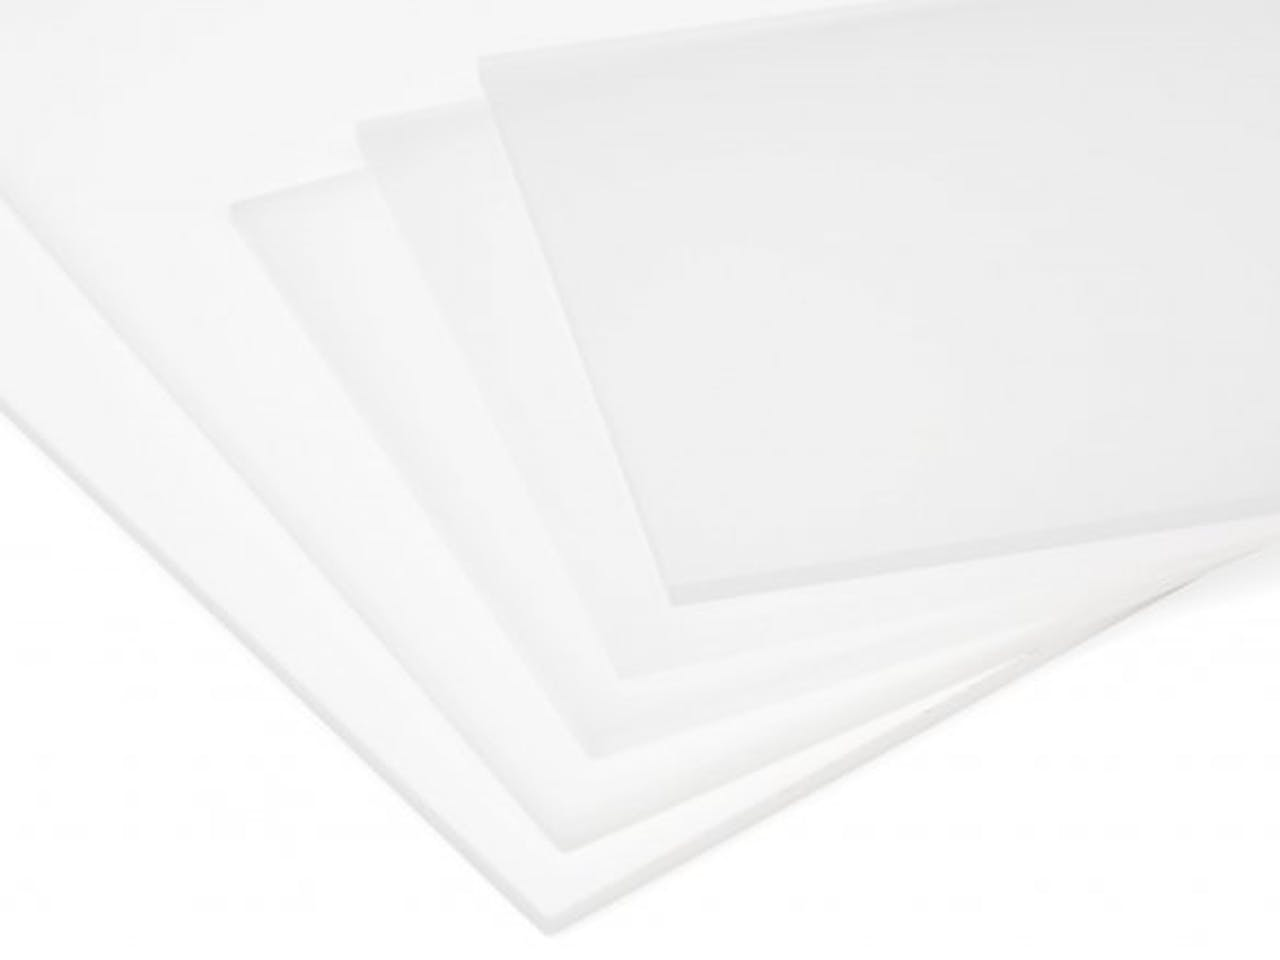 PLEXIGLAS® GS weiß (milchig), 3,0 x 250 x 500, weiß-opak (WH01)